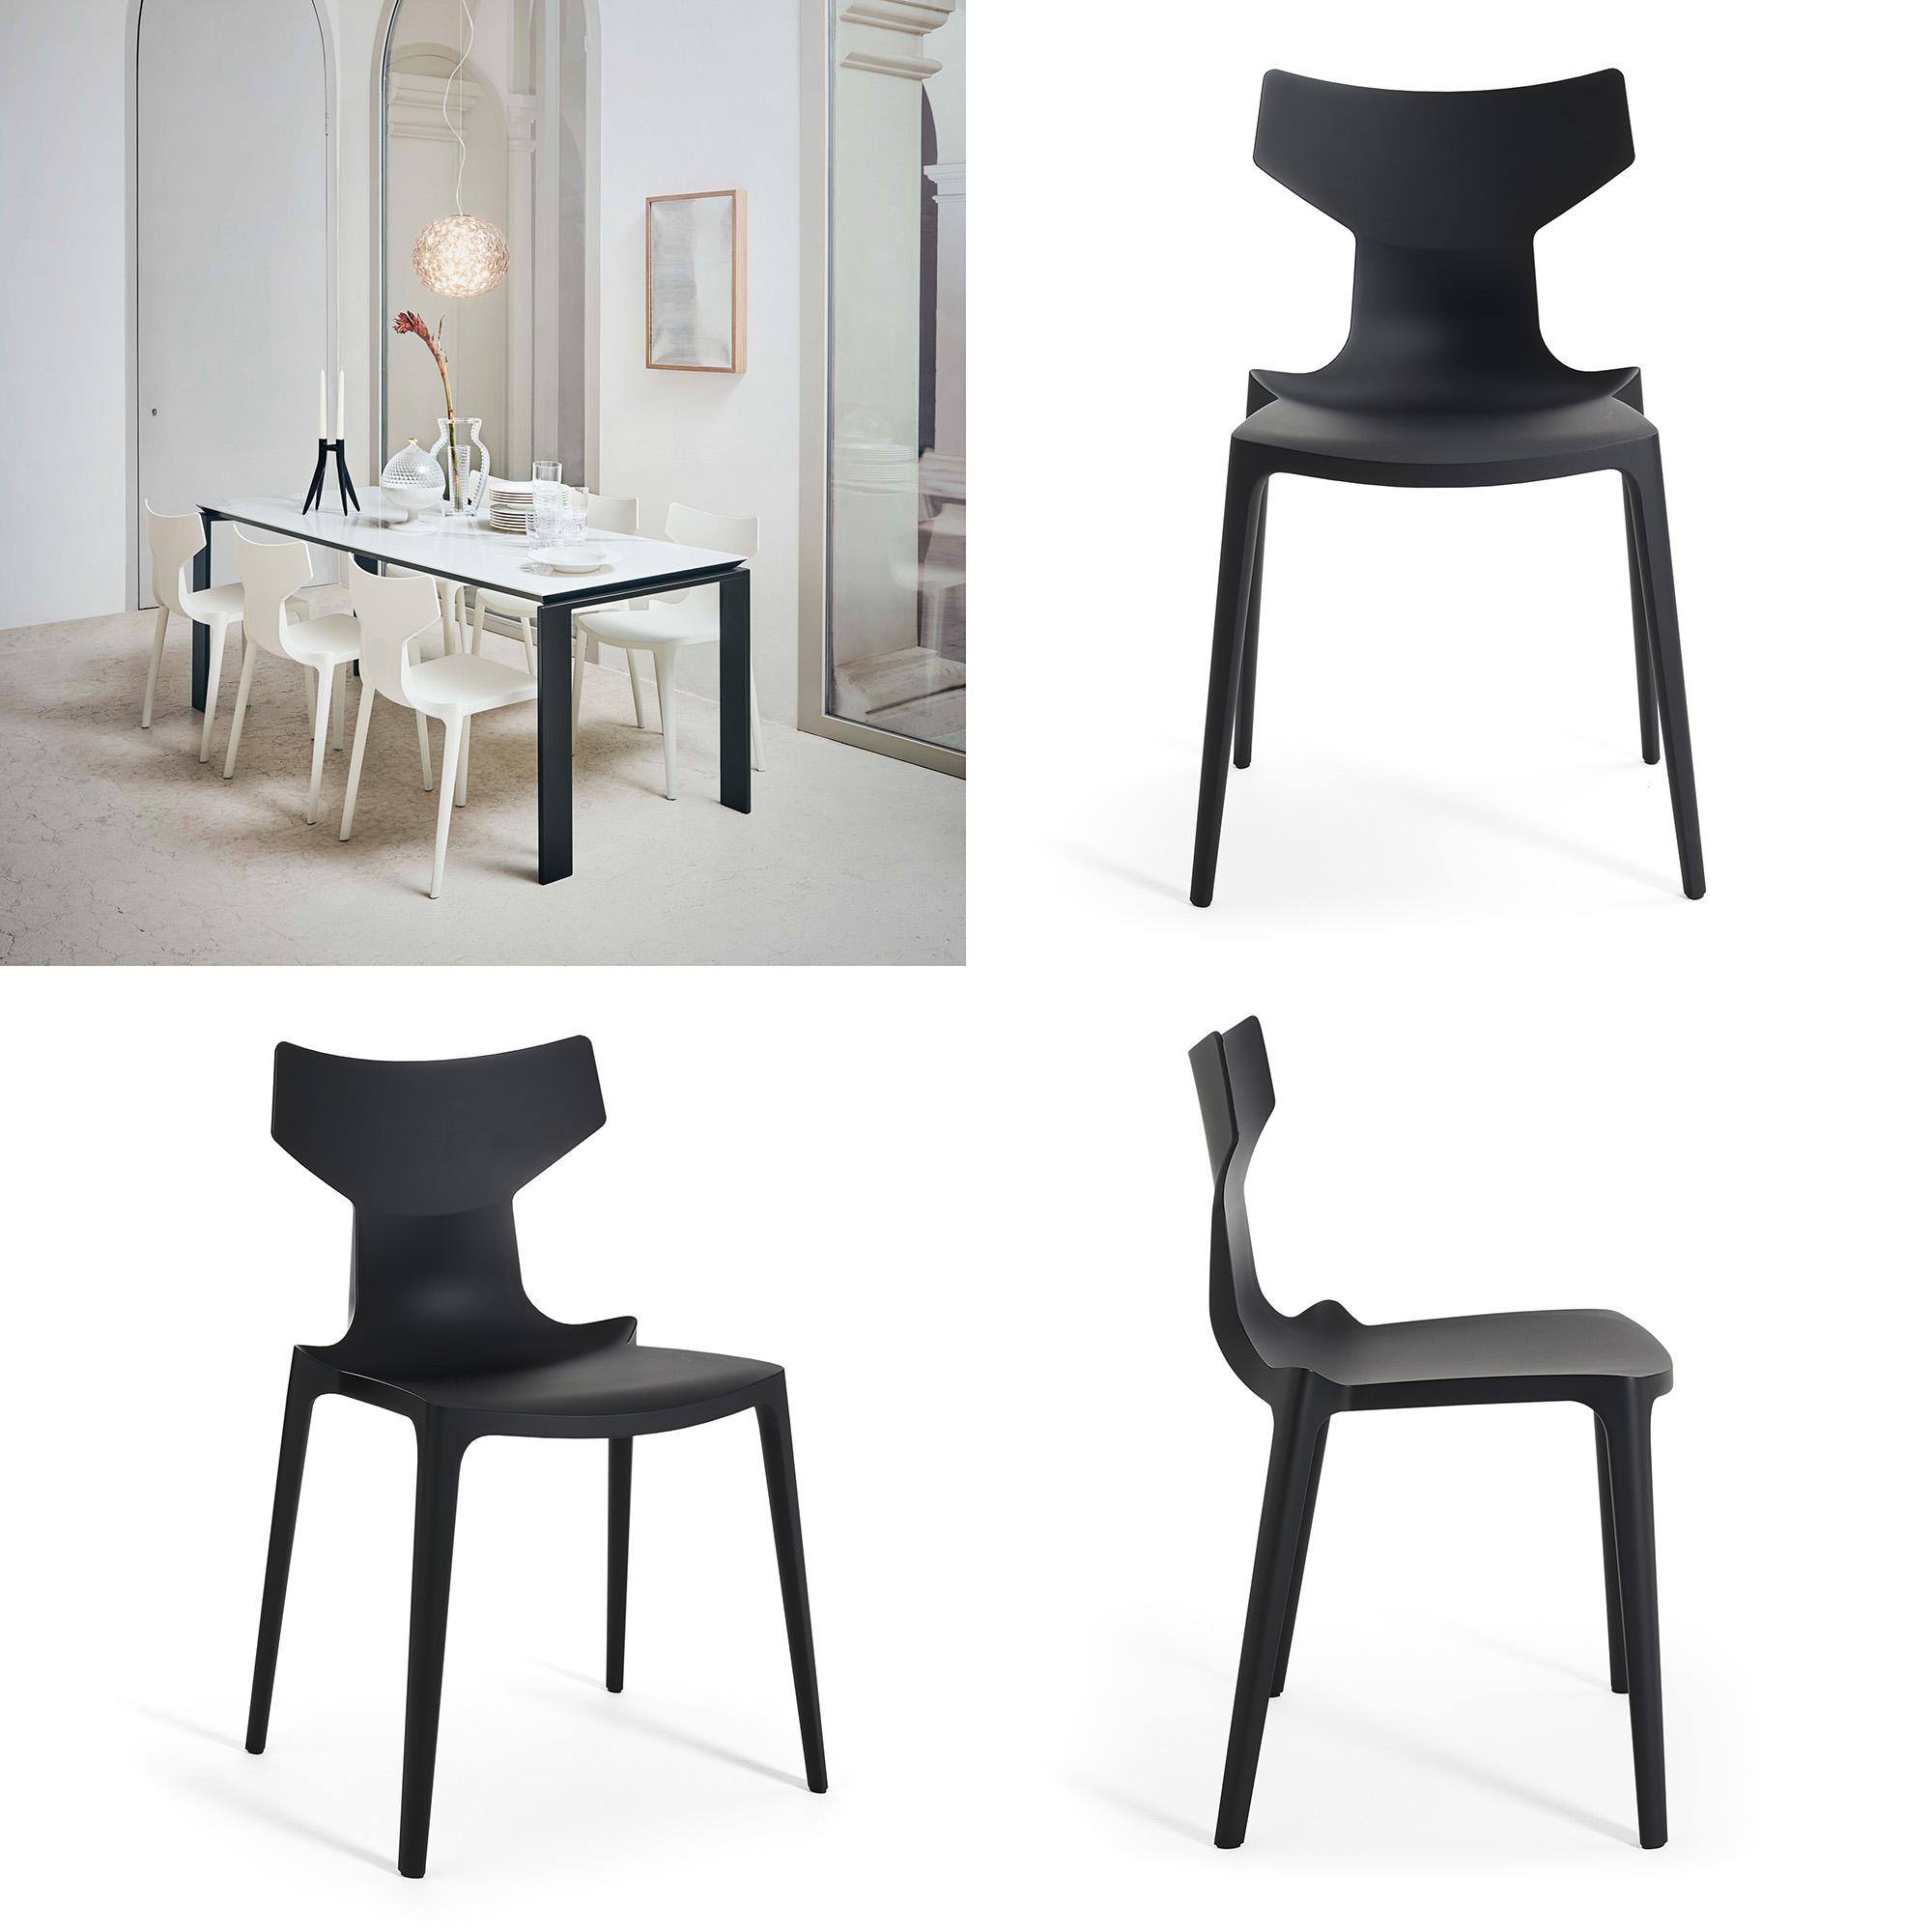 Re-Chair_イメージ.jpg